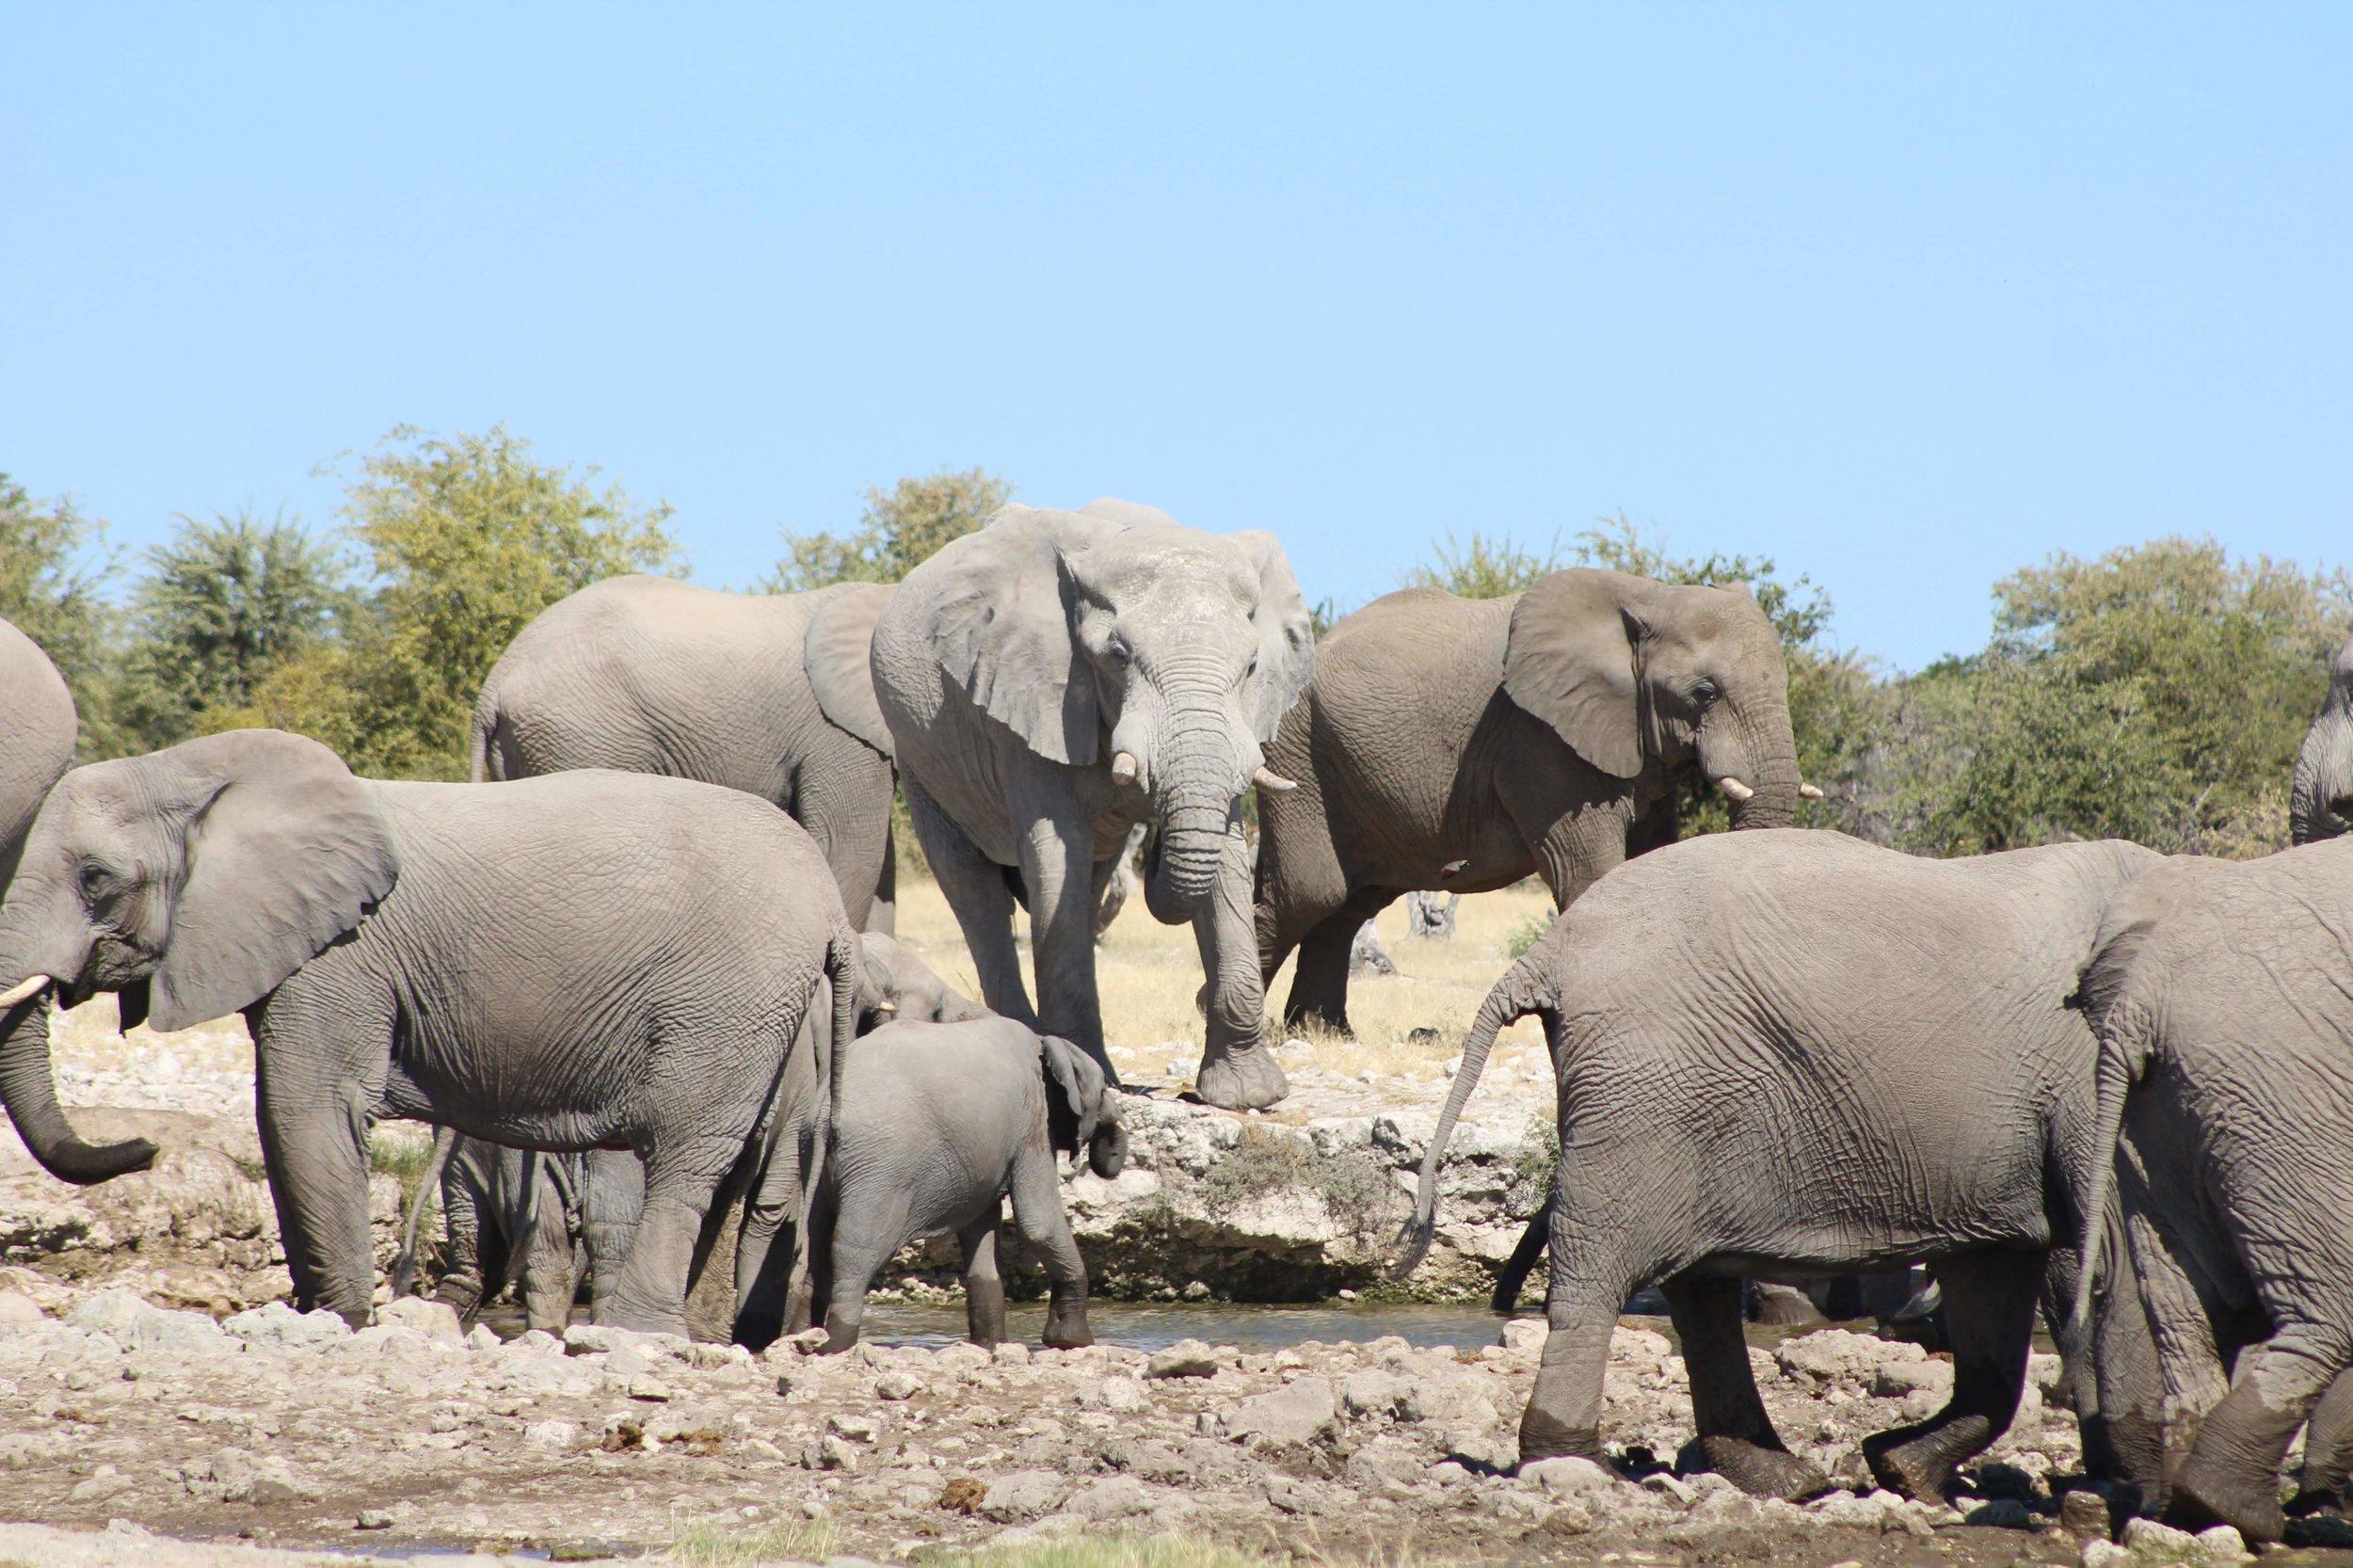 Elephants at the watering hole, Etosha, Namibia. photo by Xavier student, David Constantine.